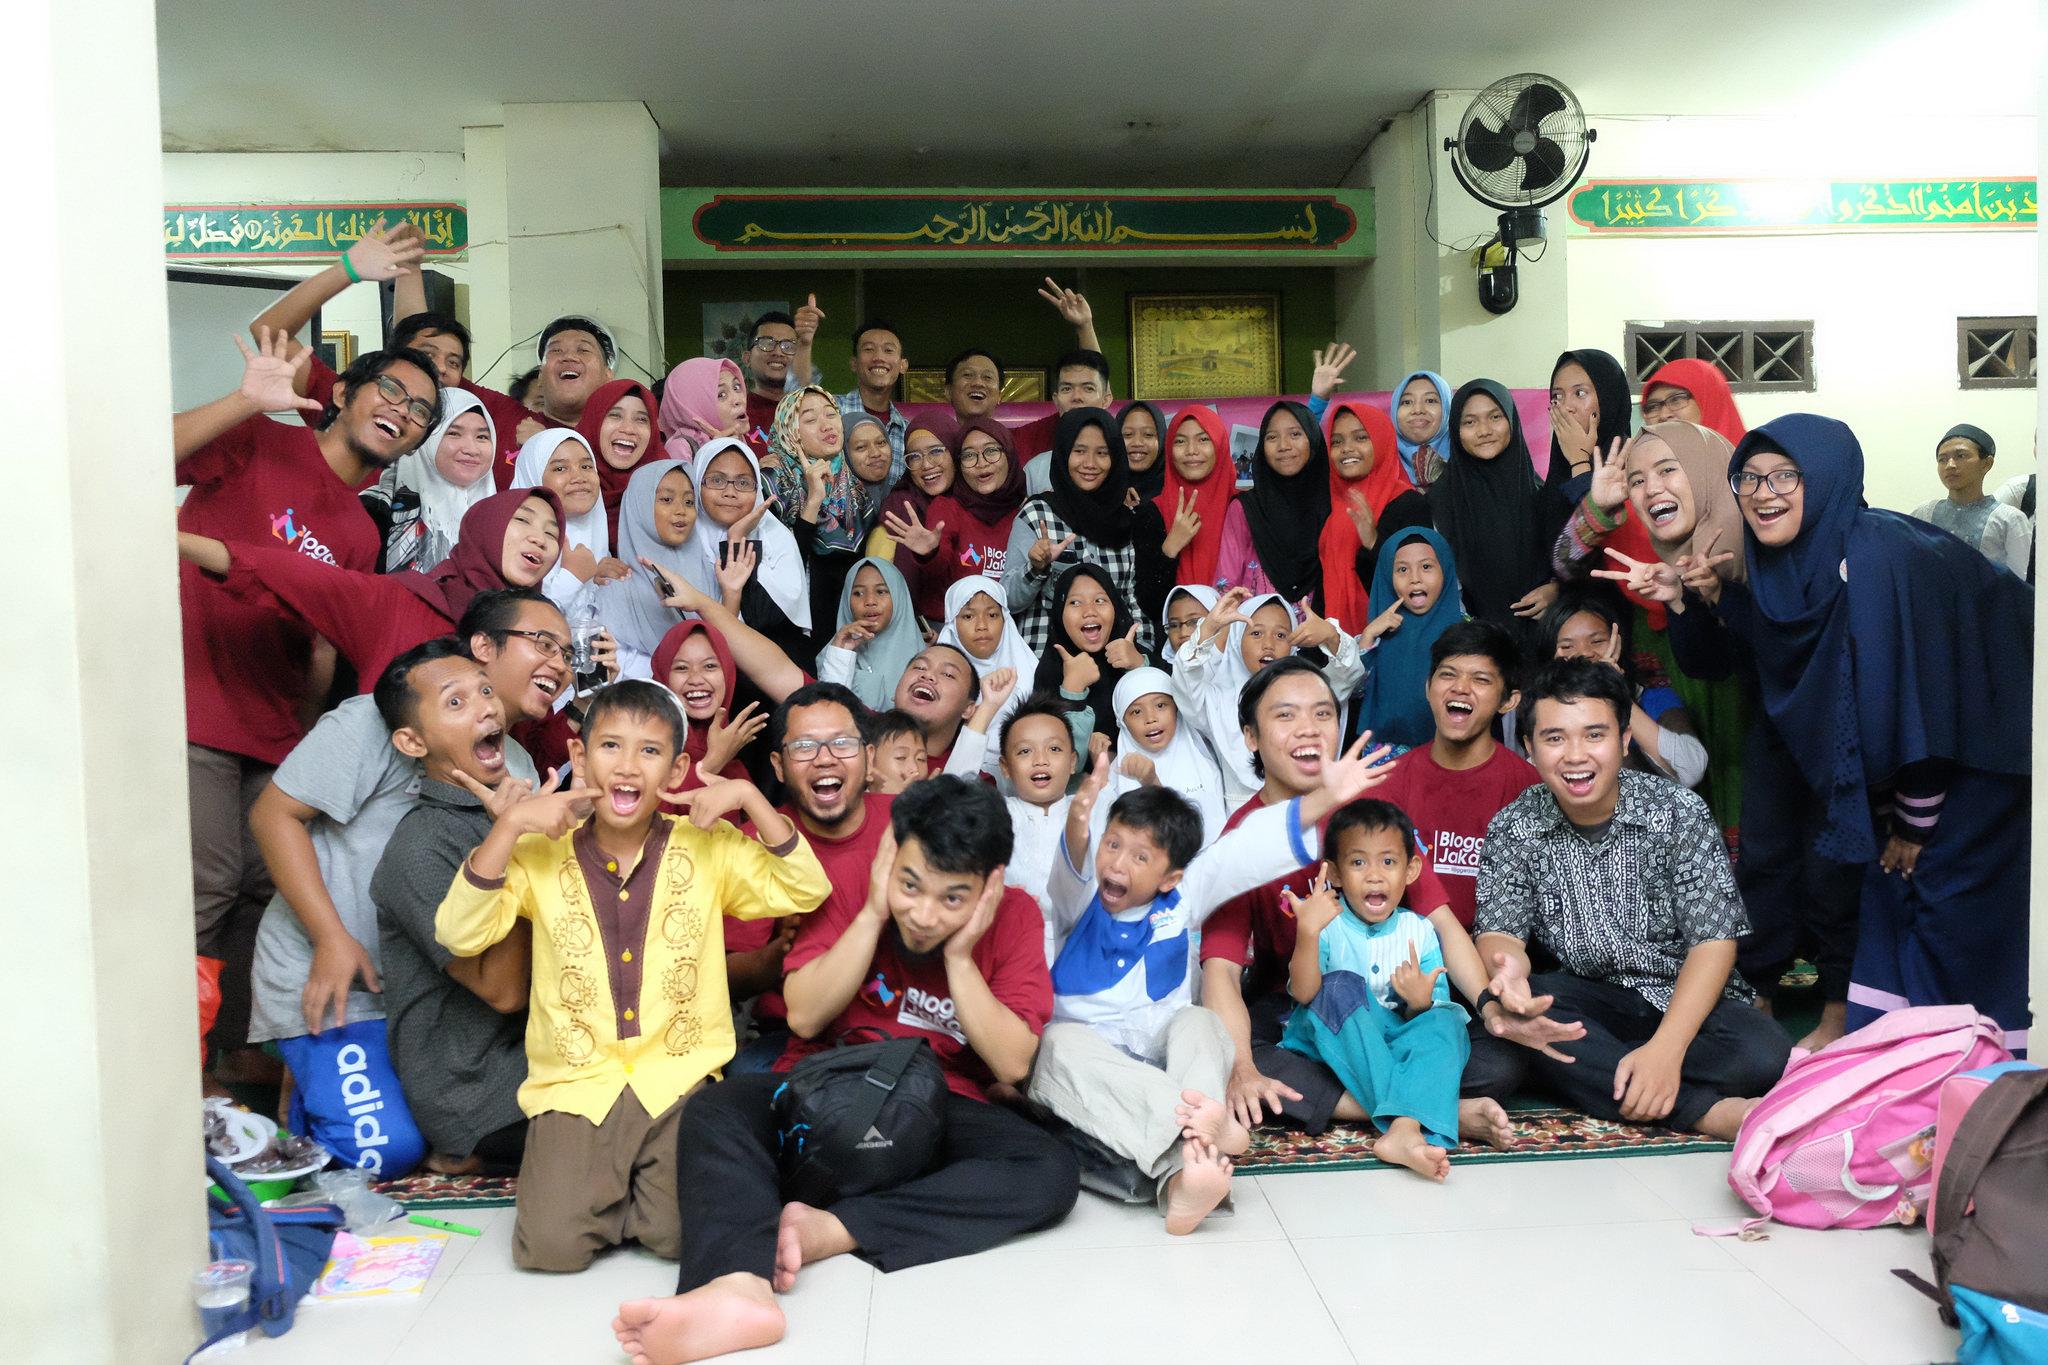 Ulang Tahun Blogger Jakarta Merajut Kebersamaan